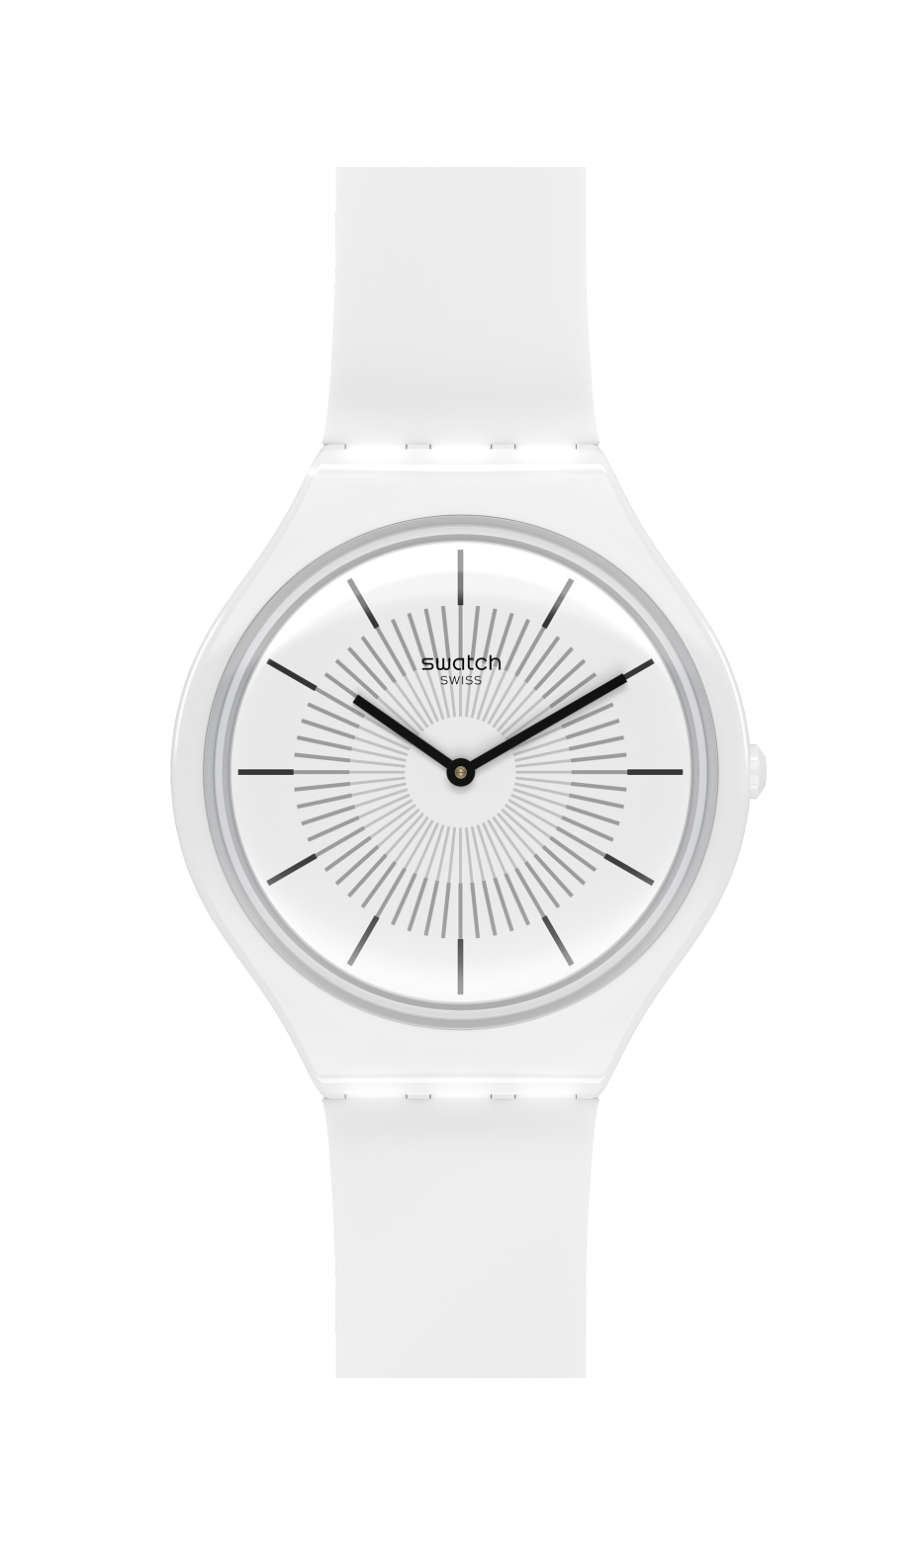 Swatch - SKINPURE - 1